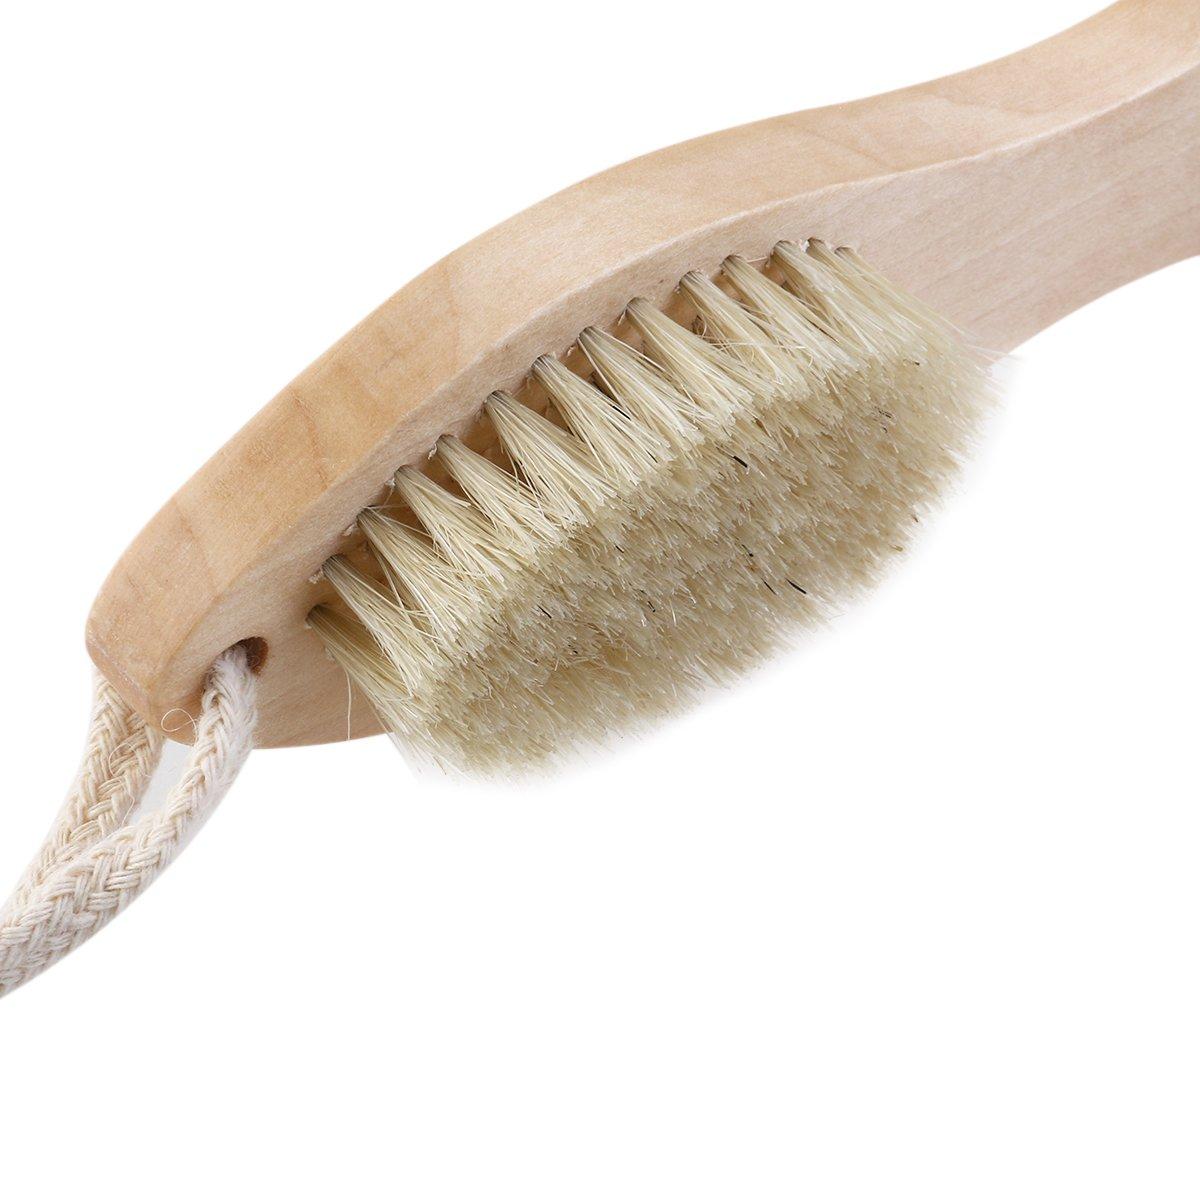 4-in-1 Foot Brush File Nail Brush Callus Reducer Pumice Stone for Feet Exfoliating Brush